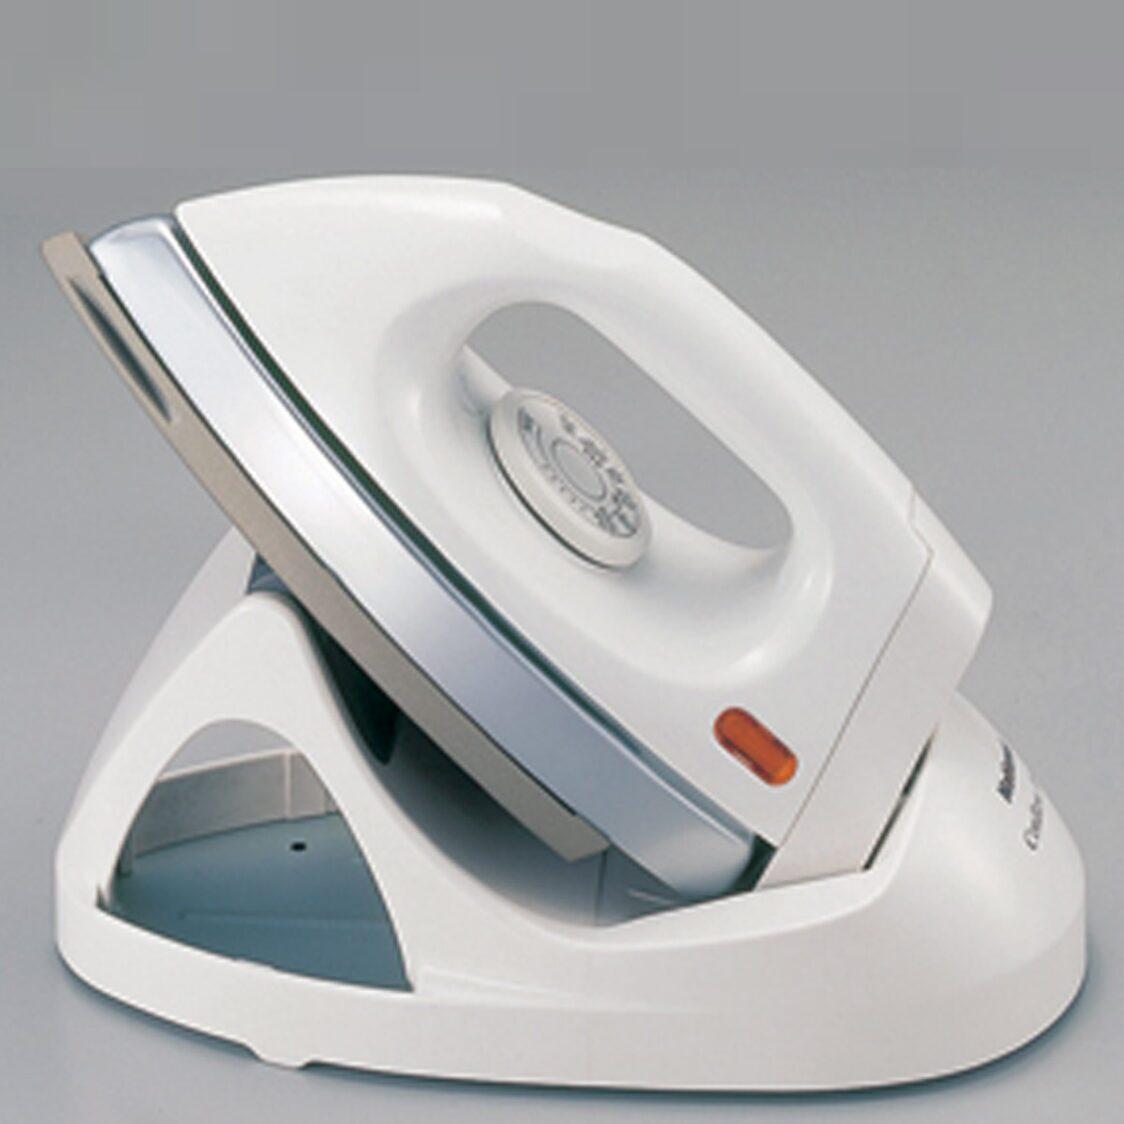 Panasonic Electric Dry Iron Cordless NI-100DX